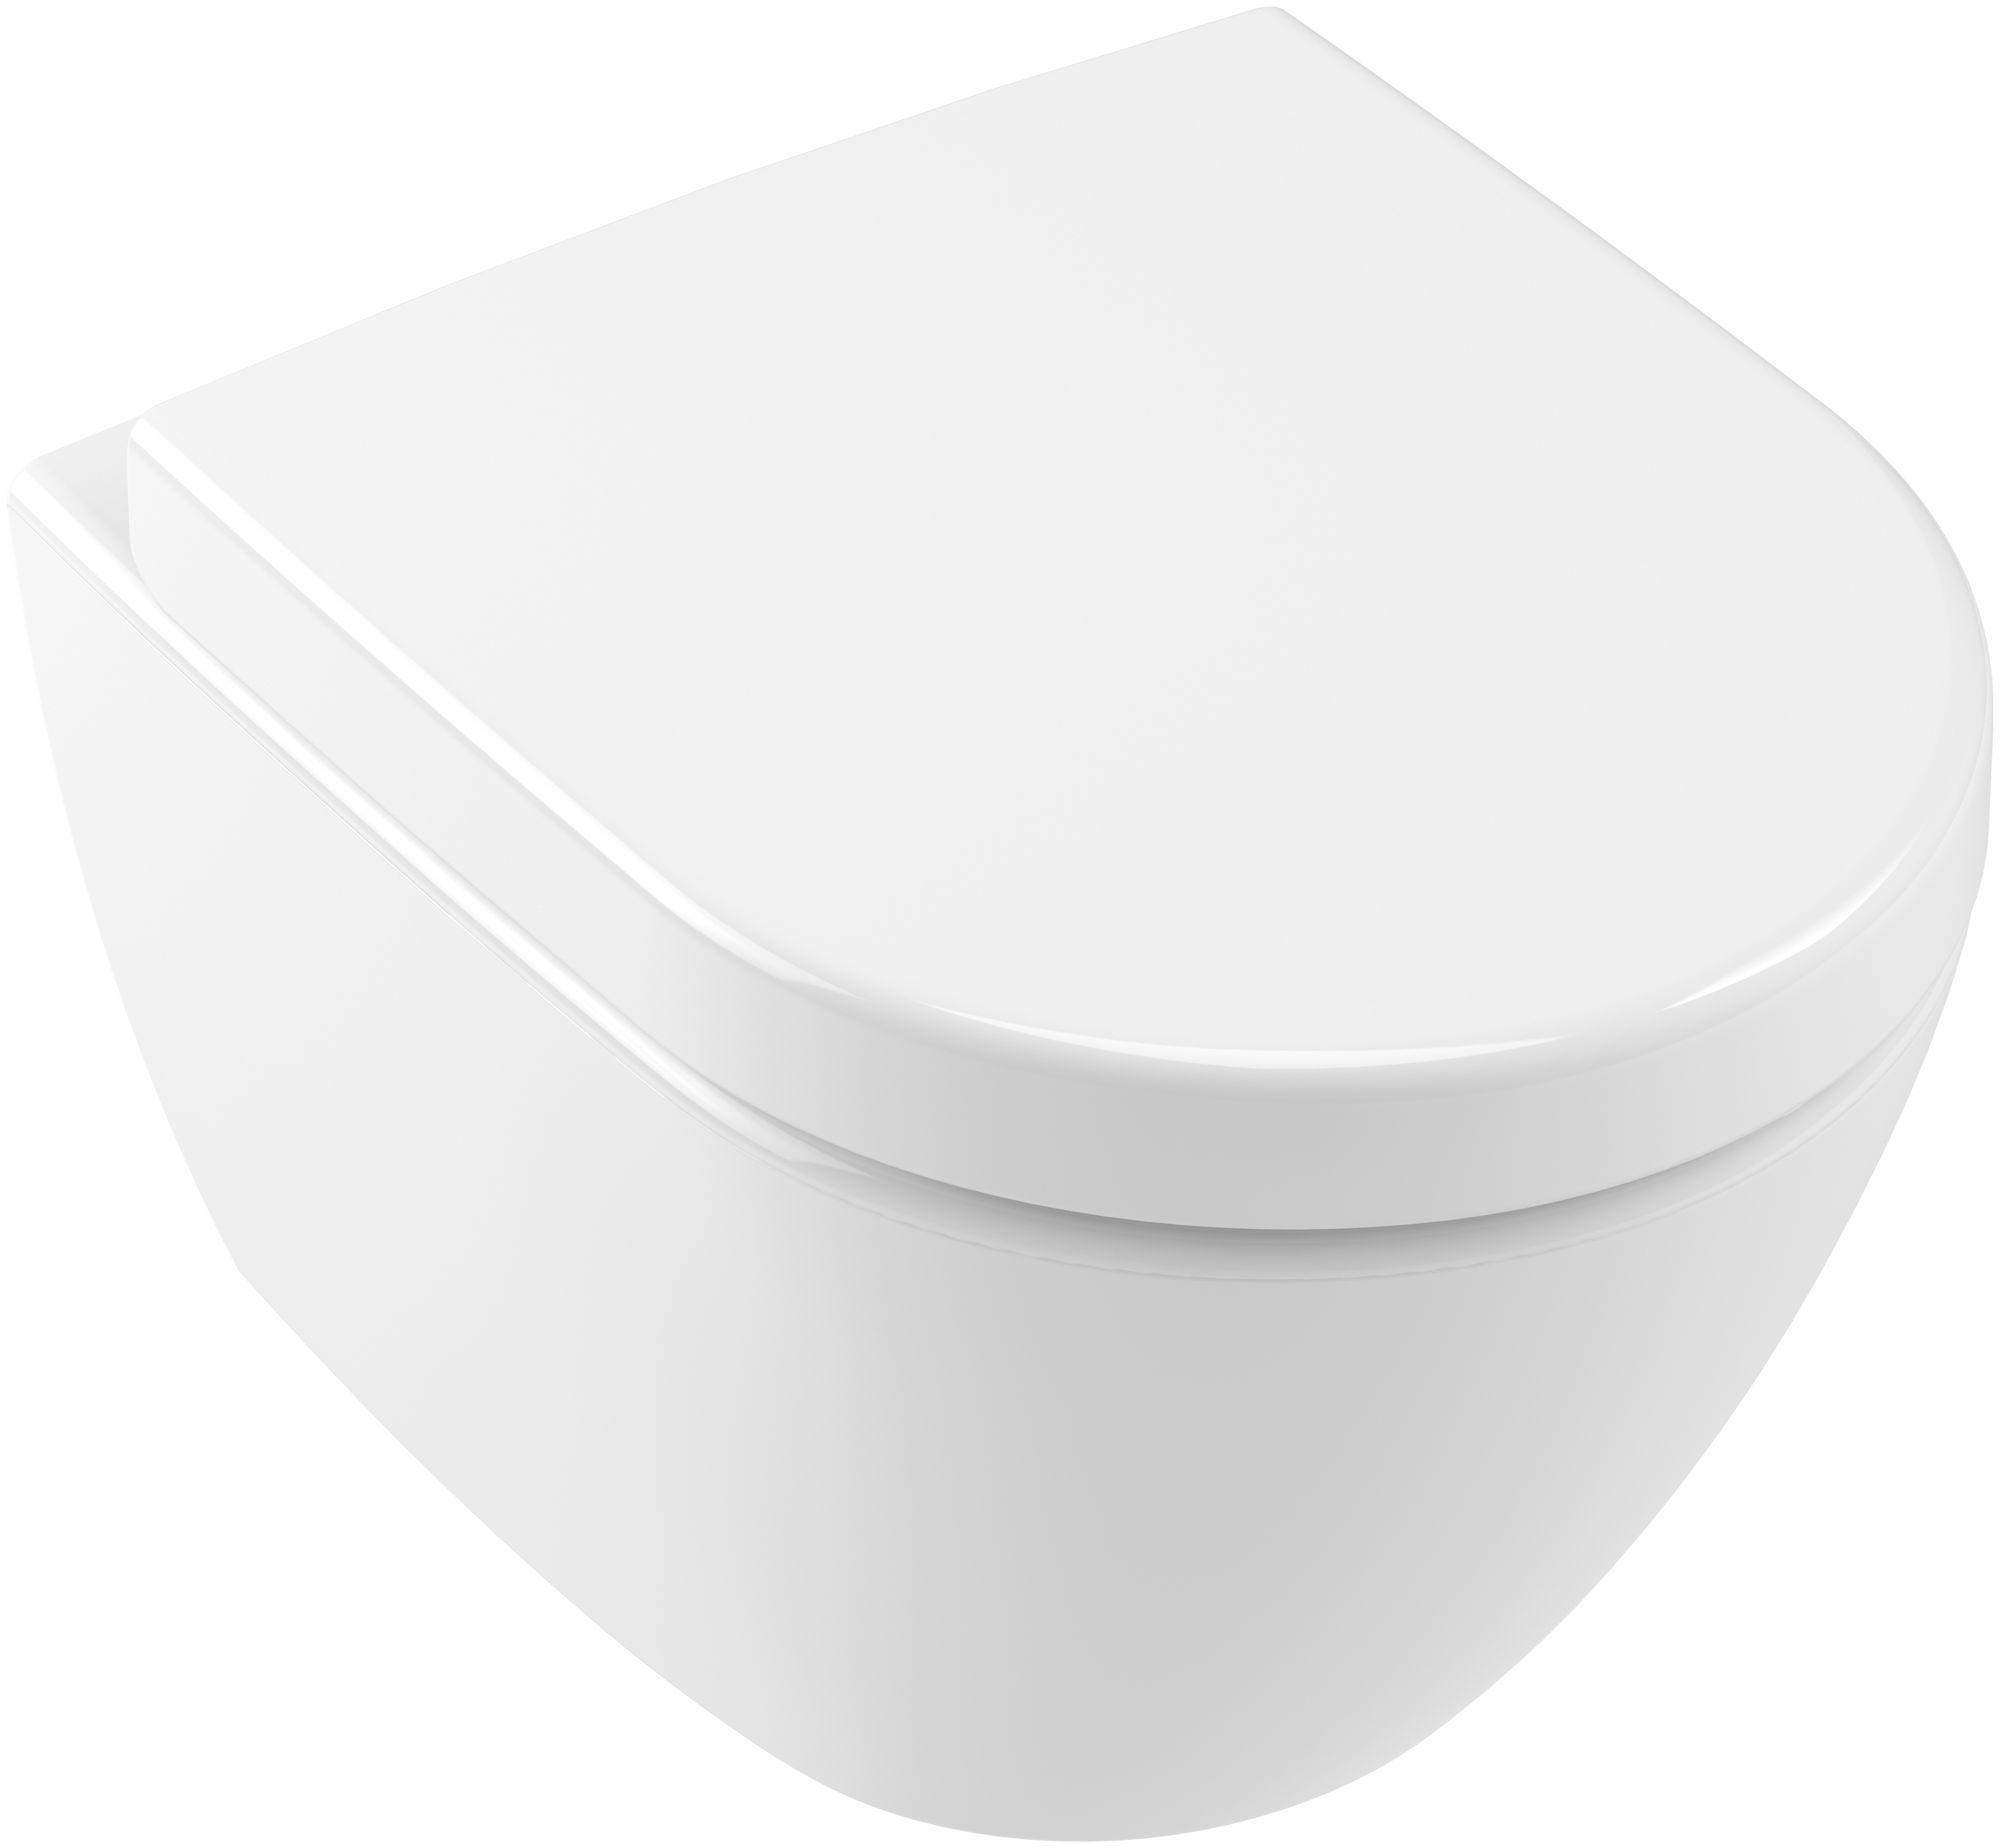 Villeroy & Boch Subway 2.0 Tiefspül-Wand-WC compact DirectFlush mit offenem Spülrand L:48xB:35,5cm weiß mit CeramicPlus 5606R0R1